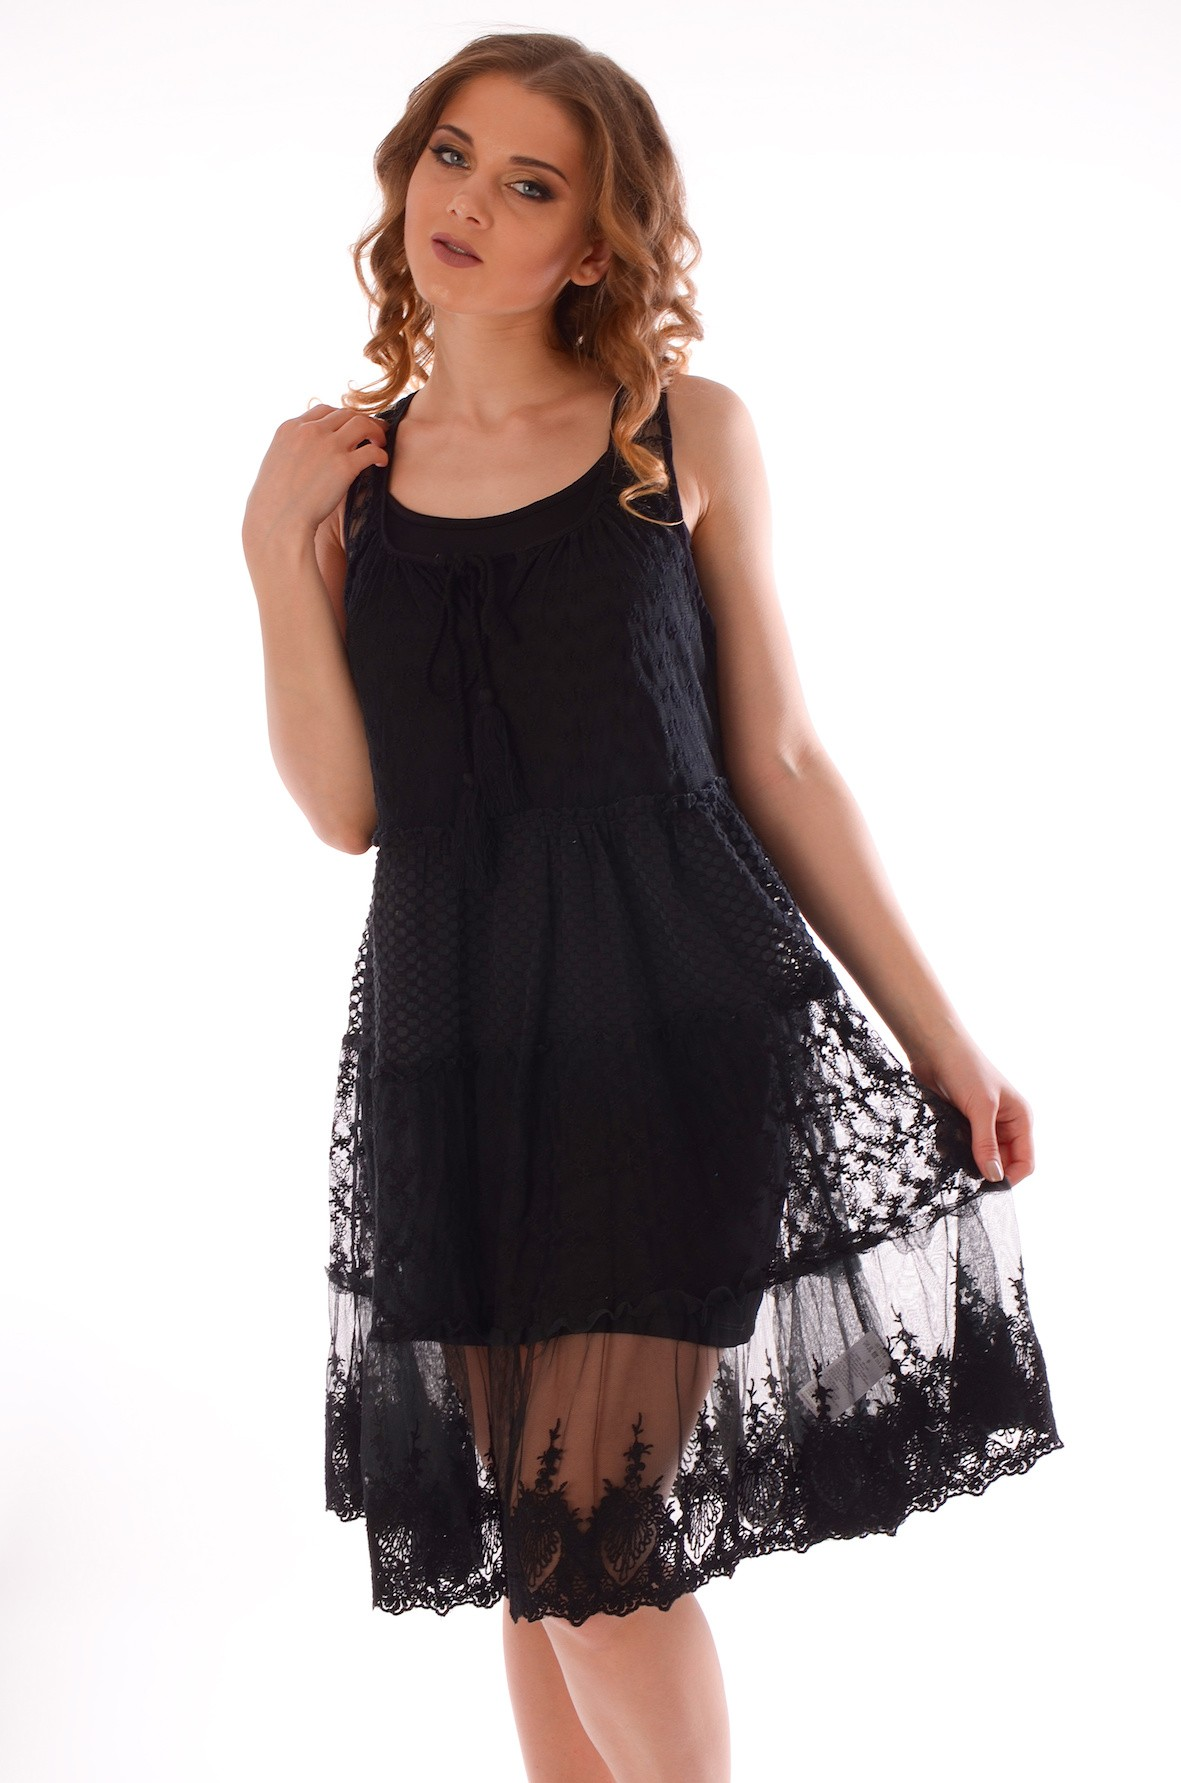 a4e7cd3ec19e Черное пляжное платье без рукавов Iconique IC7 015 N